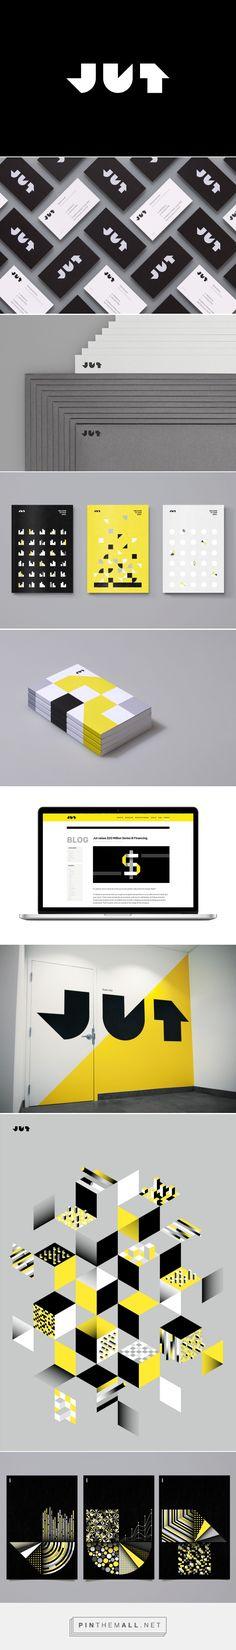 Jut Branding by Moniker   Fivestar Branding – Design and Branding Agency & Inspiration Gallery